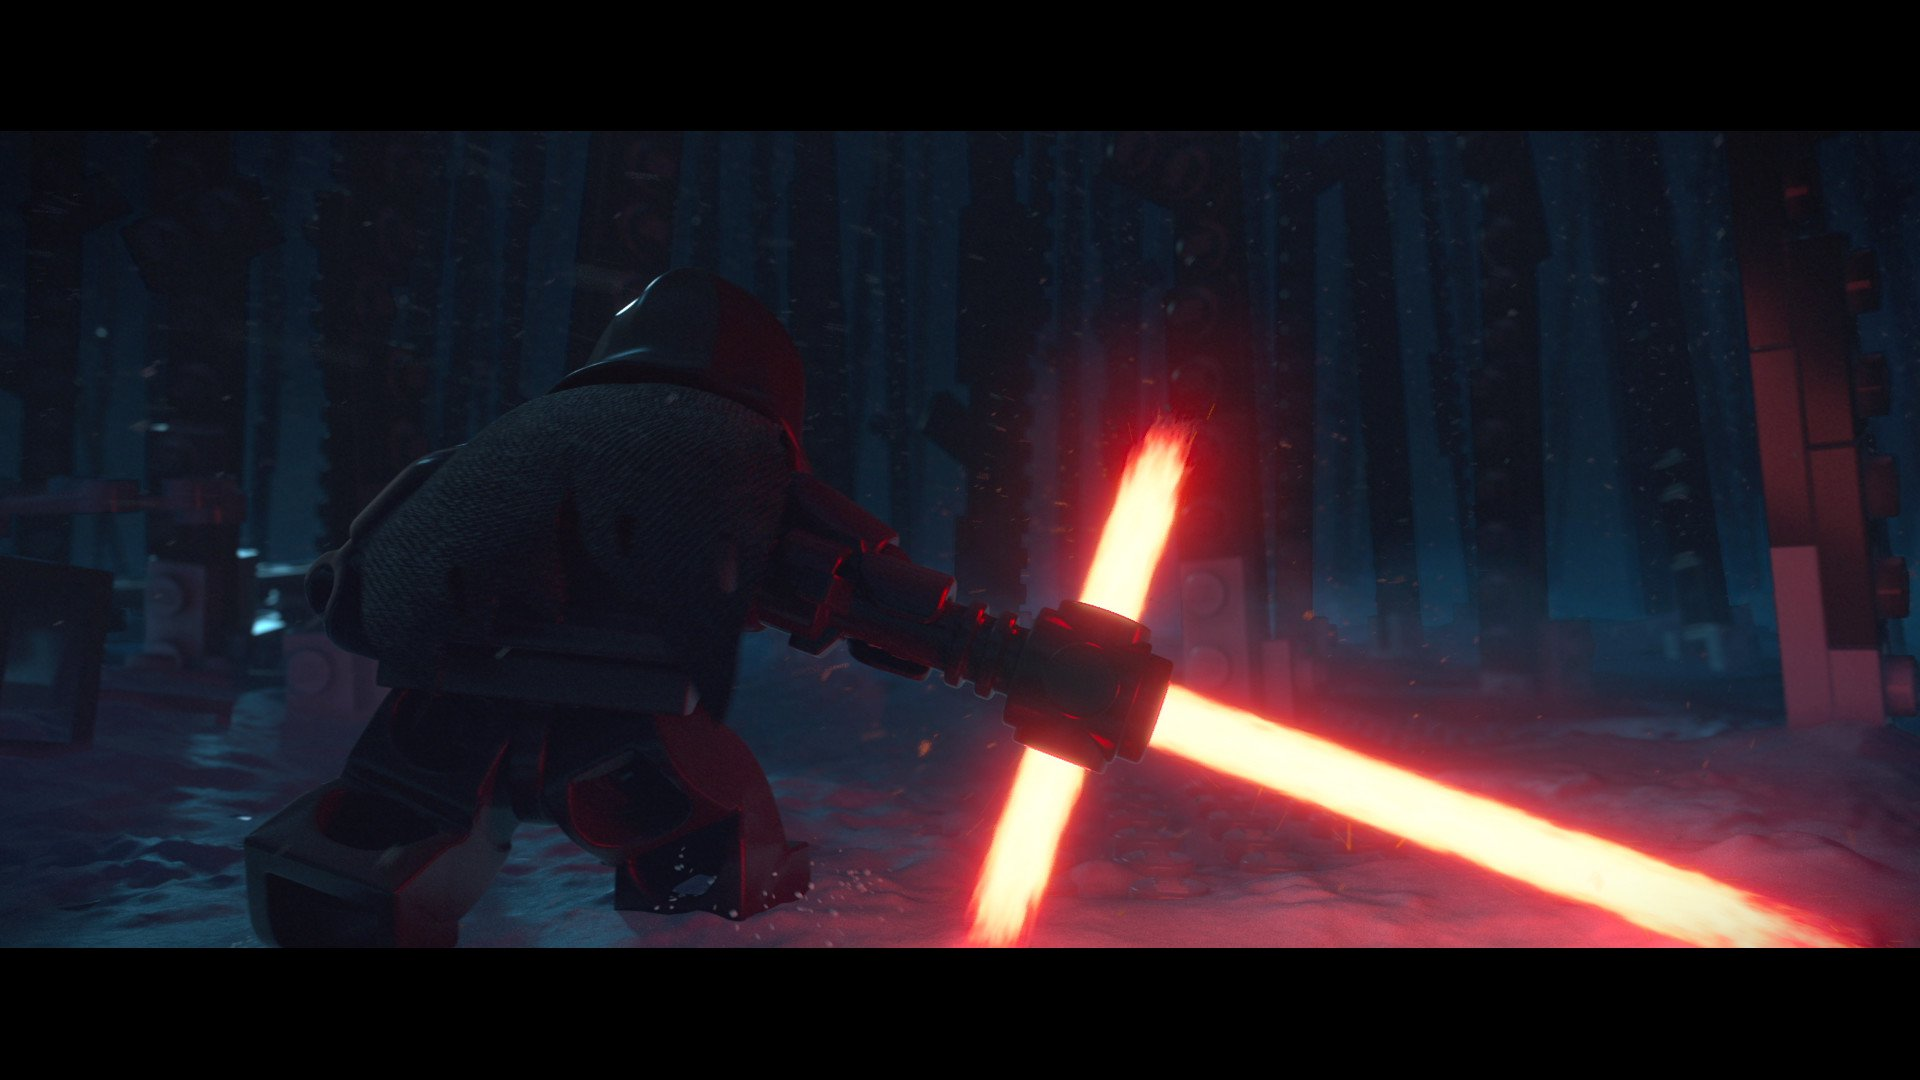 LEGO Star Wars The Force Awakens 12